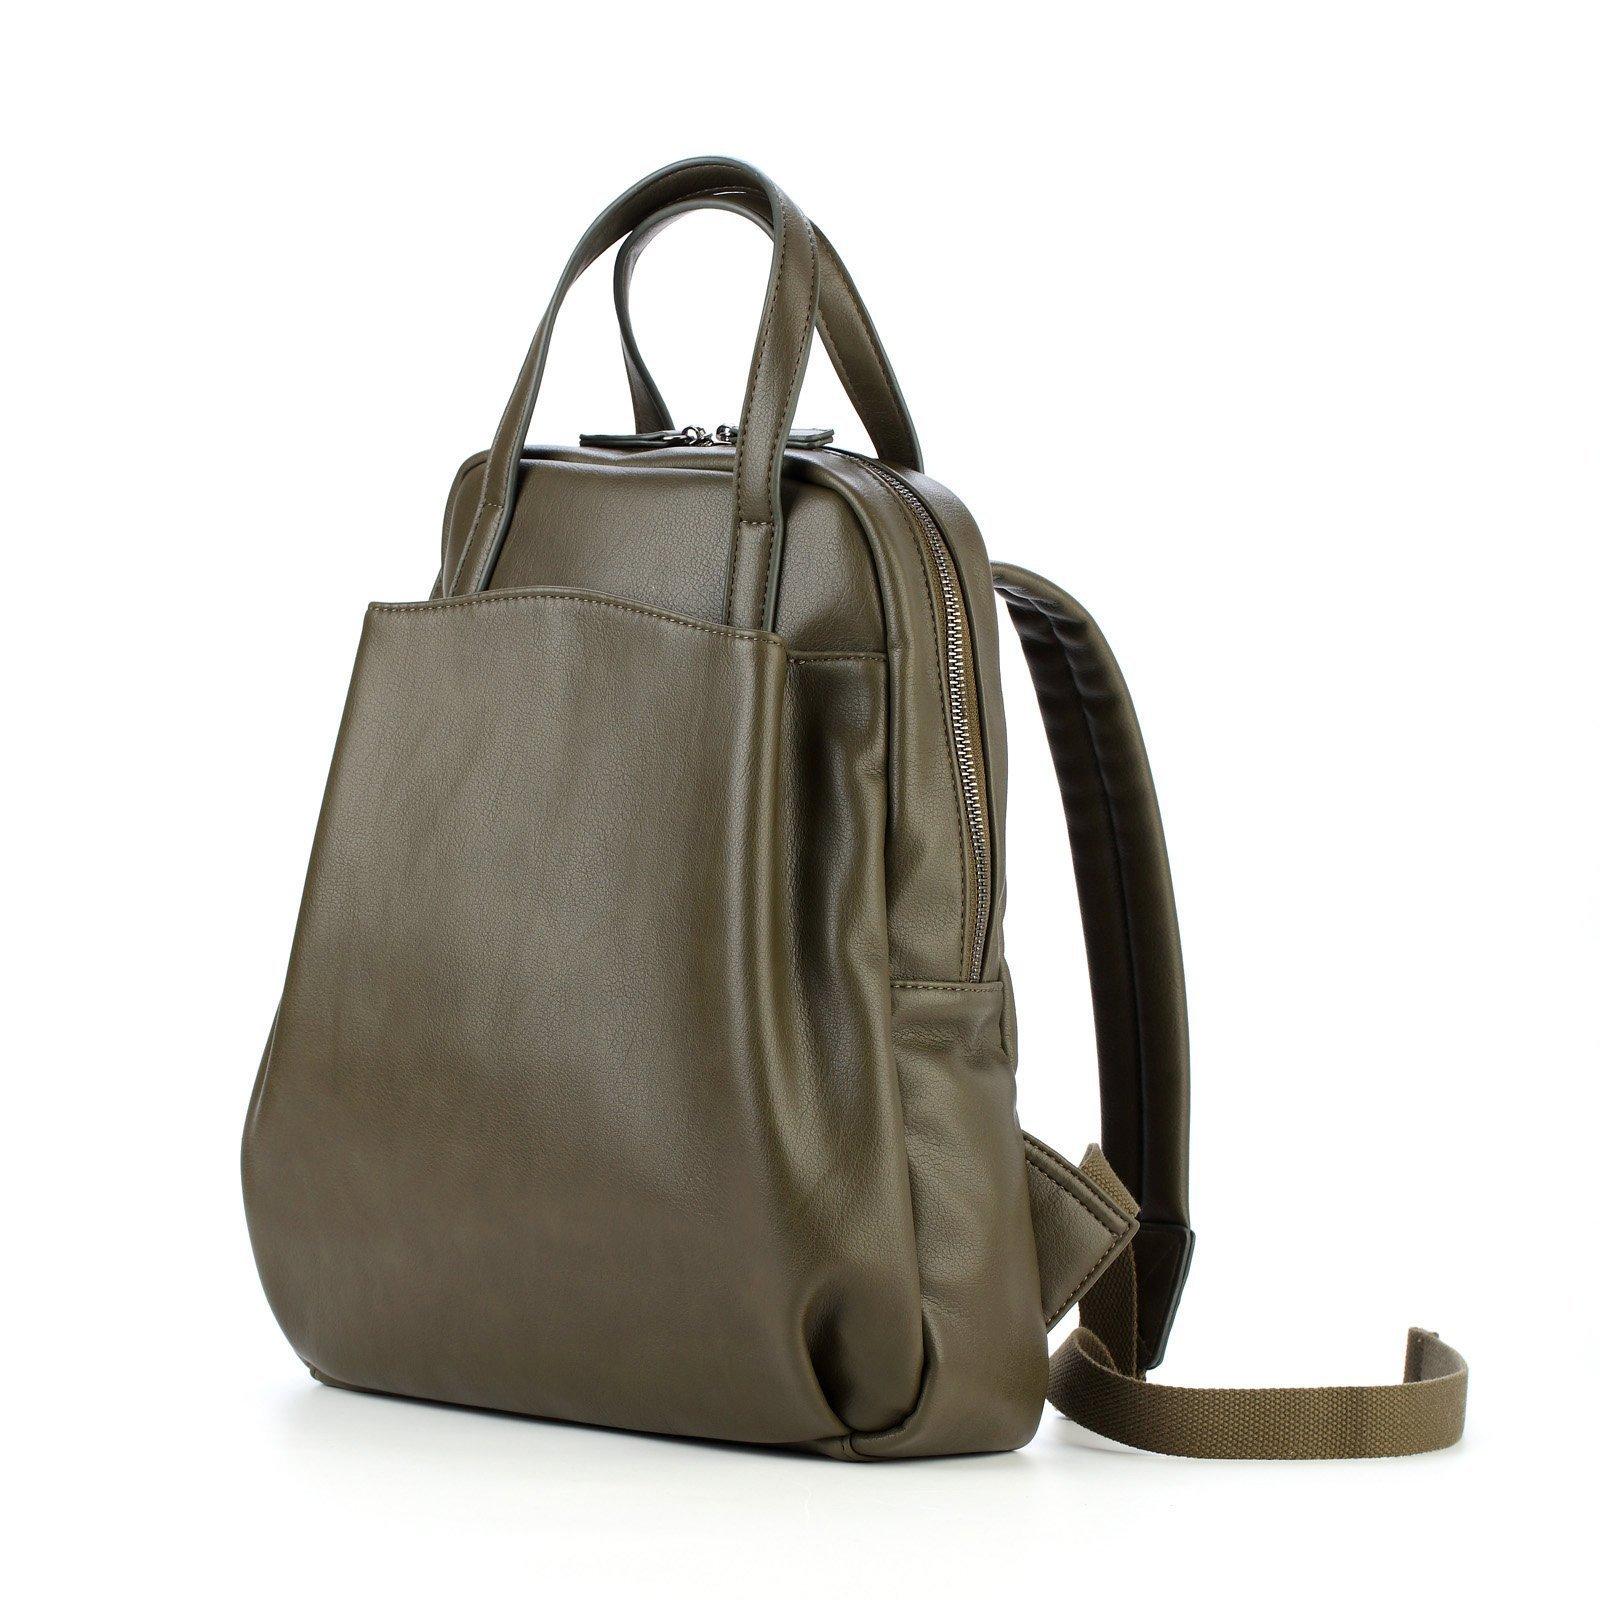 Women Soft Leather Purse Backpack Fashion Vintage Bags Lightweight School Ladies Travel Message Shoulder Handbag (Blackish green)